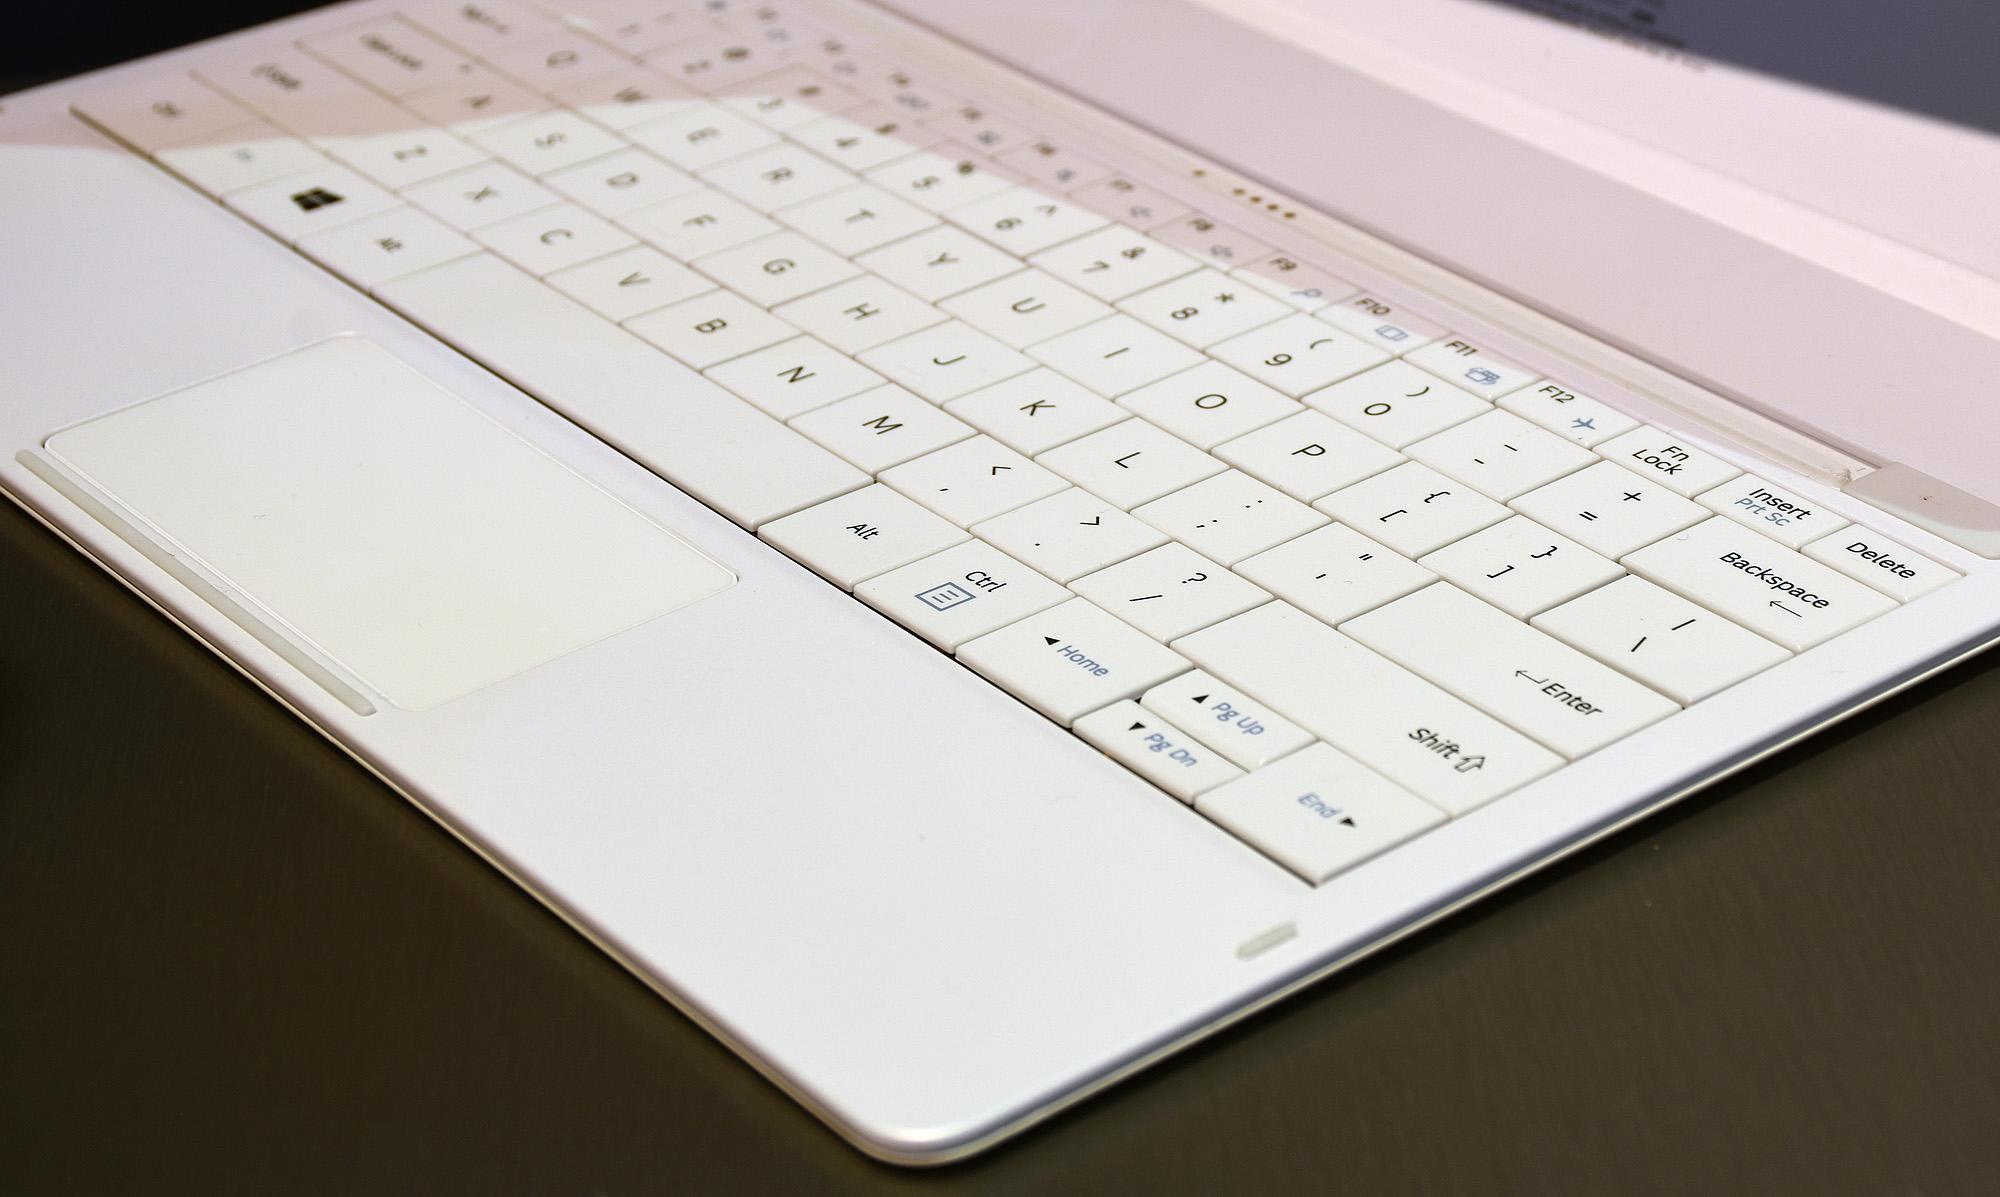 Samsung TabPro S keyboard_1